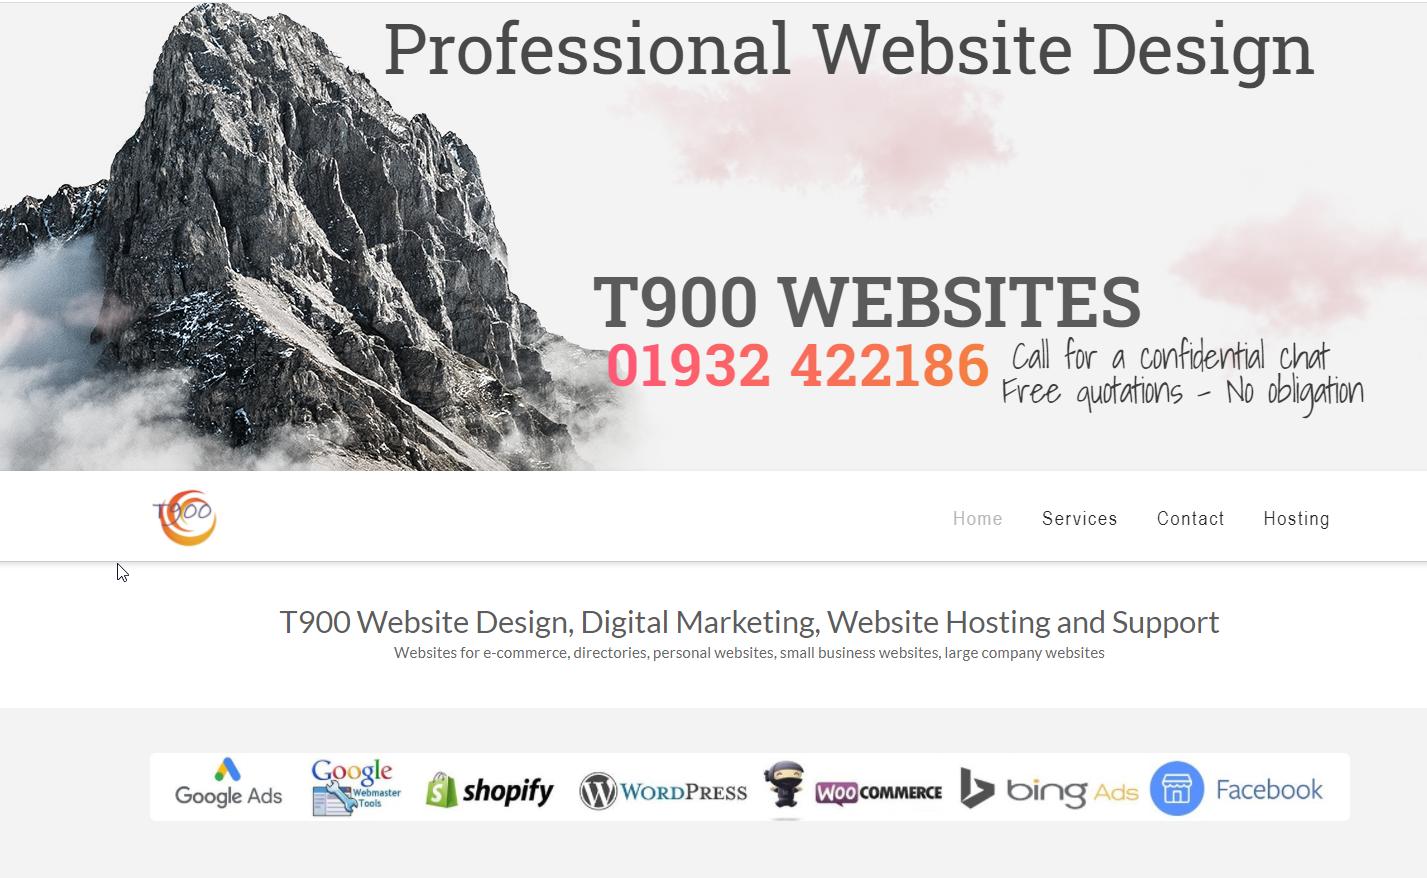 T900 Website Design